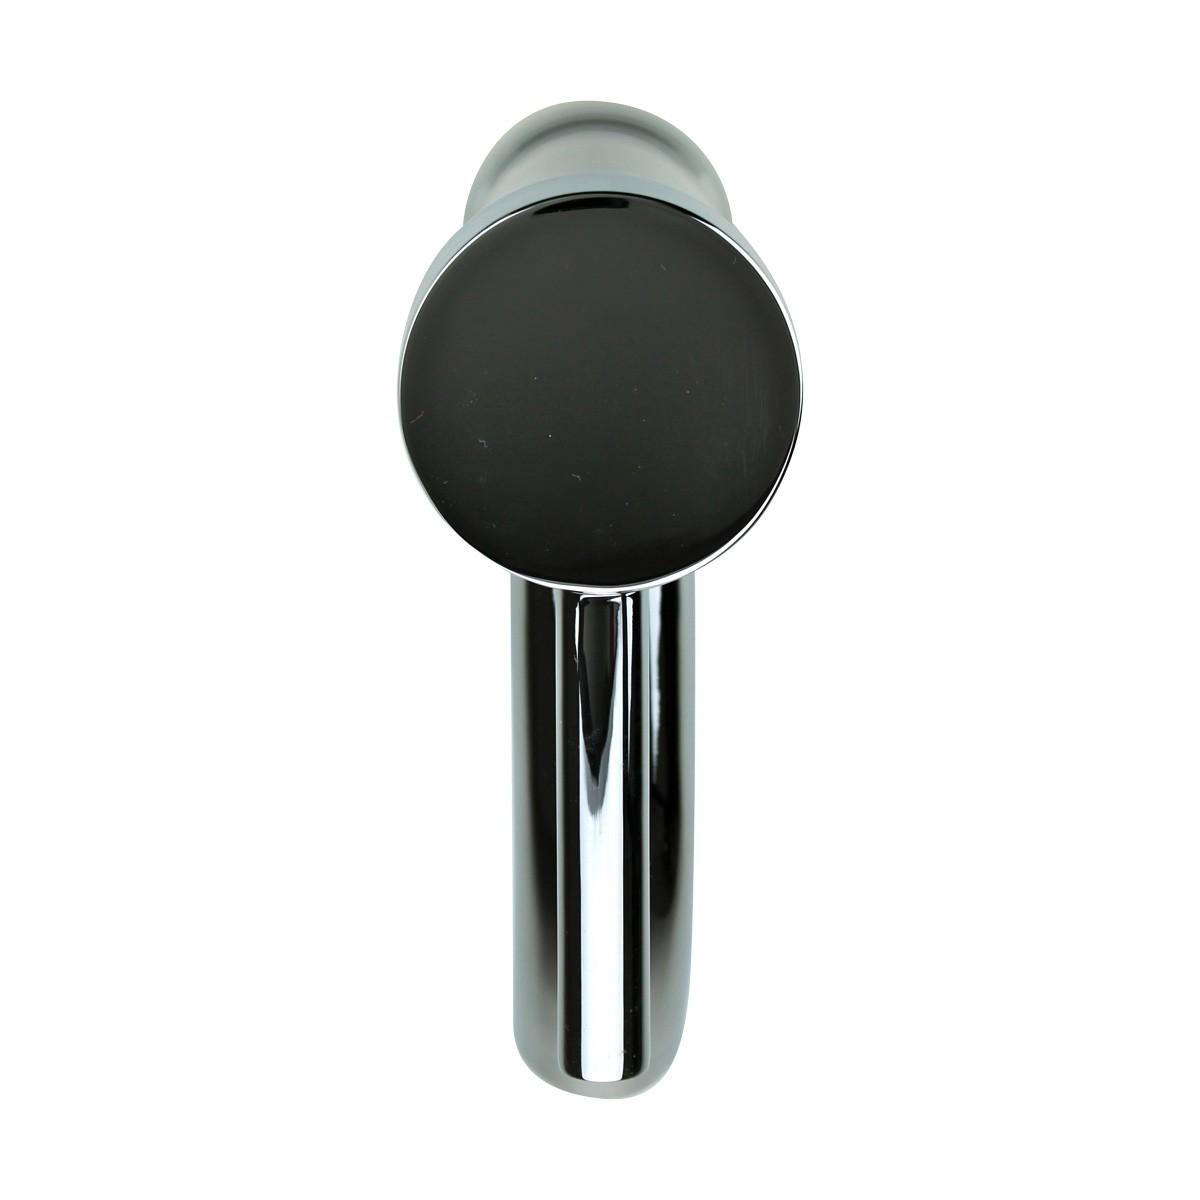 Bathroom Faucet Single Hole 1 Handle Chrome Plated Brass 9.5\